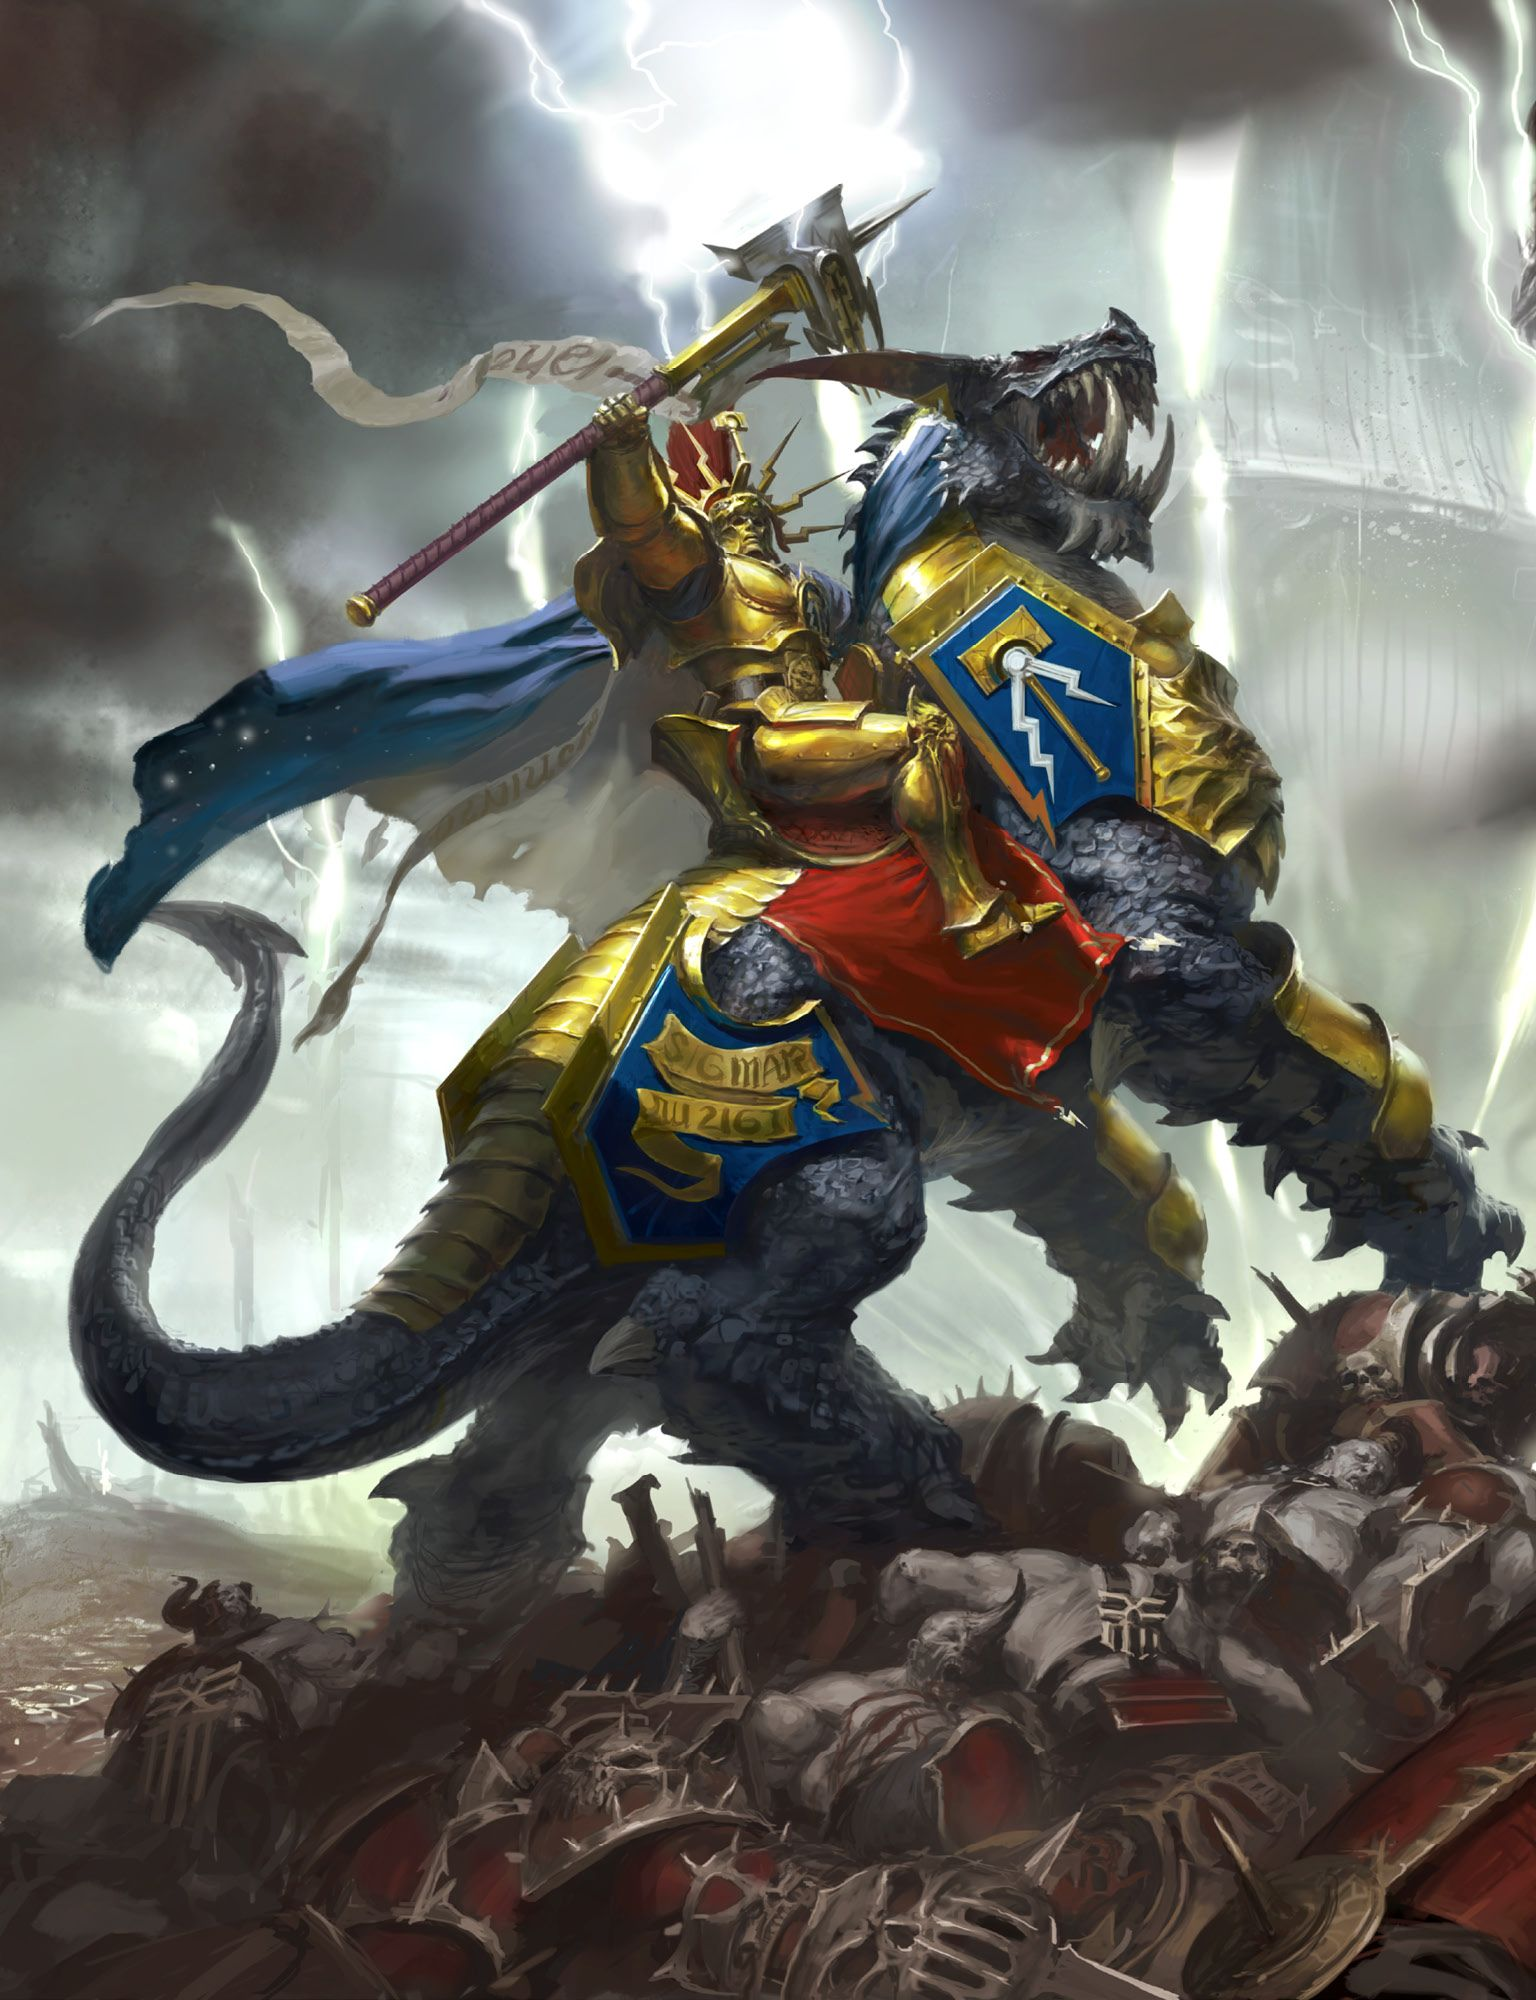 Lord Celestant #ageofsigmar #warhammer #art #fantasy #aos #gamesworkshop  #Stormcast #Chaos | Warhammer art, Warhammer fantasy, Stormcast eternals